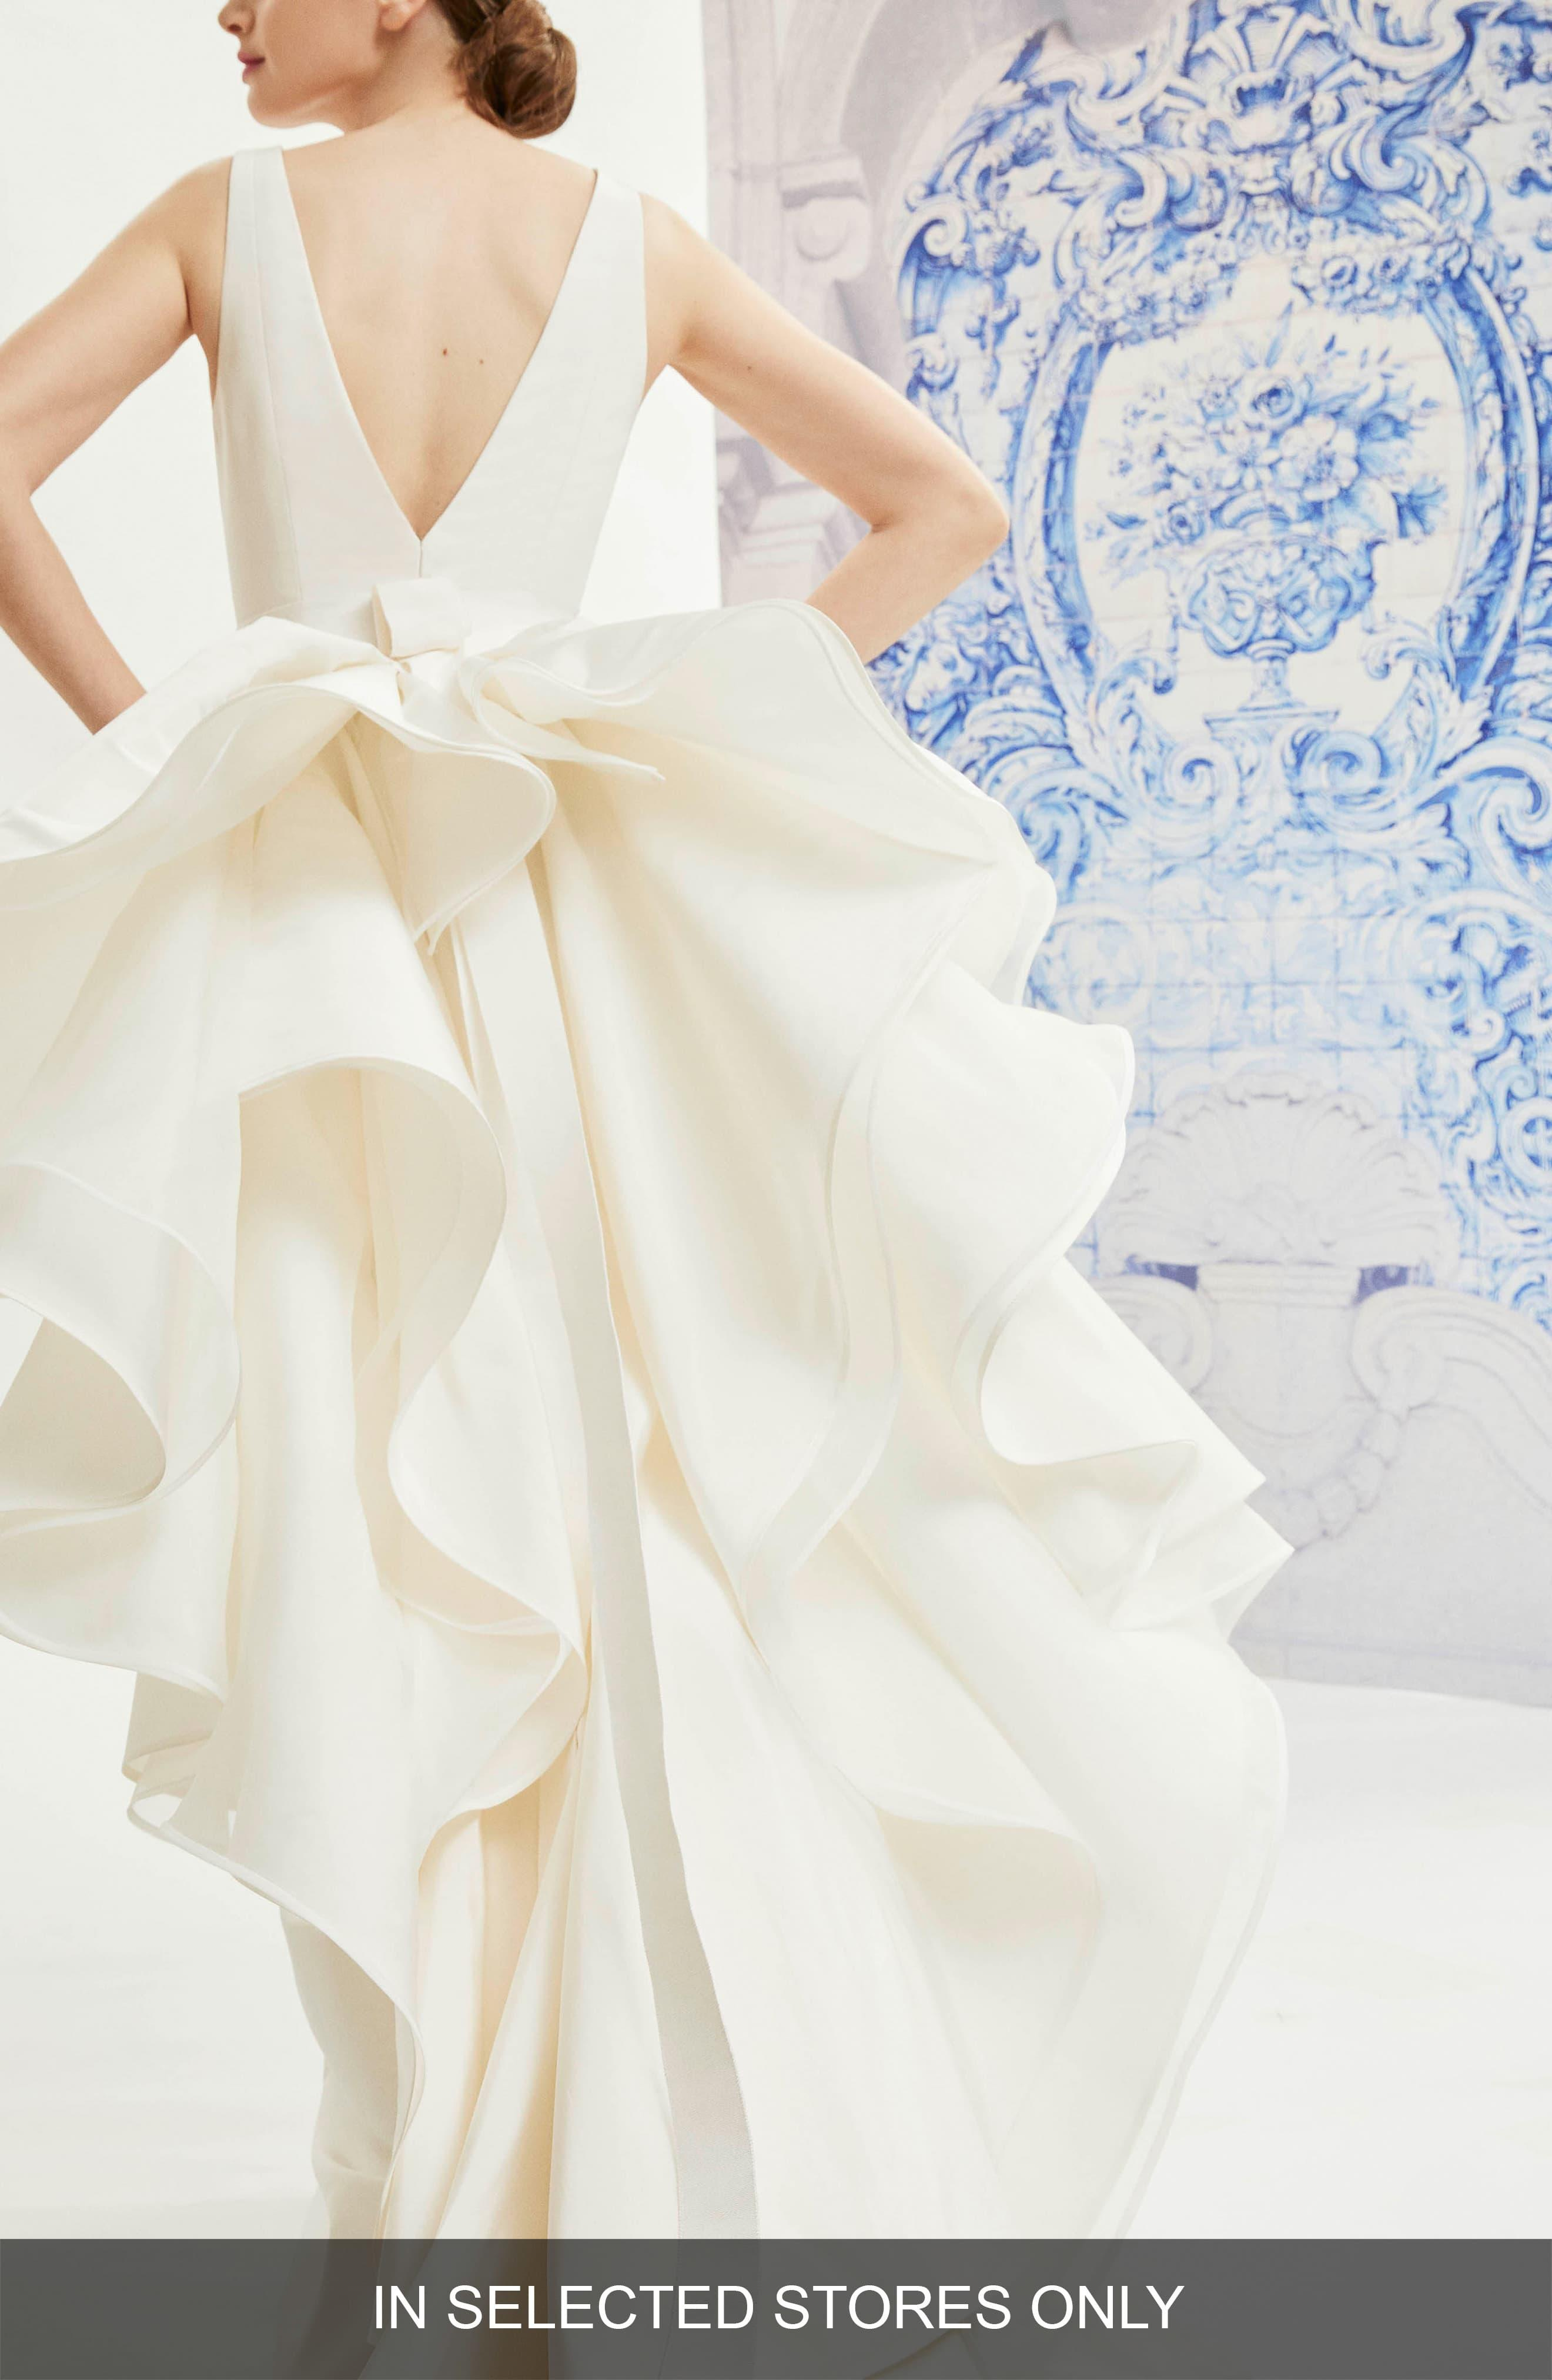 e1be57ef83d48 Carolina Herrera White Idelle V-neck Organza Back Silk Wedding Dress. View  fullscreen